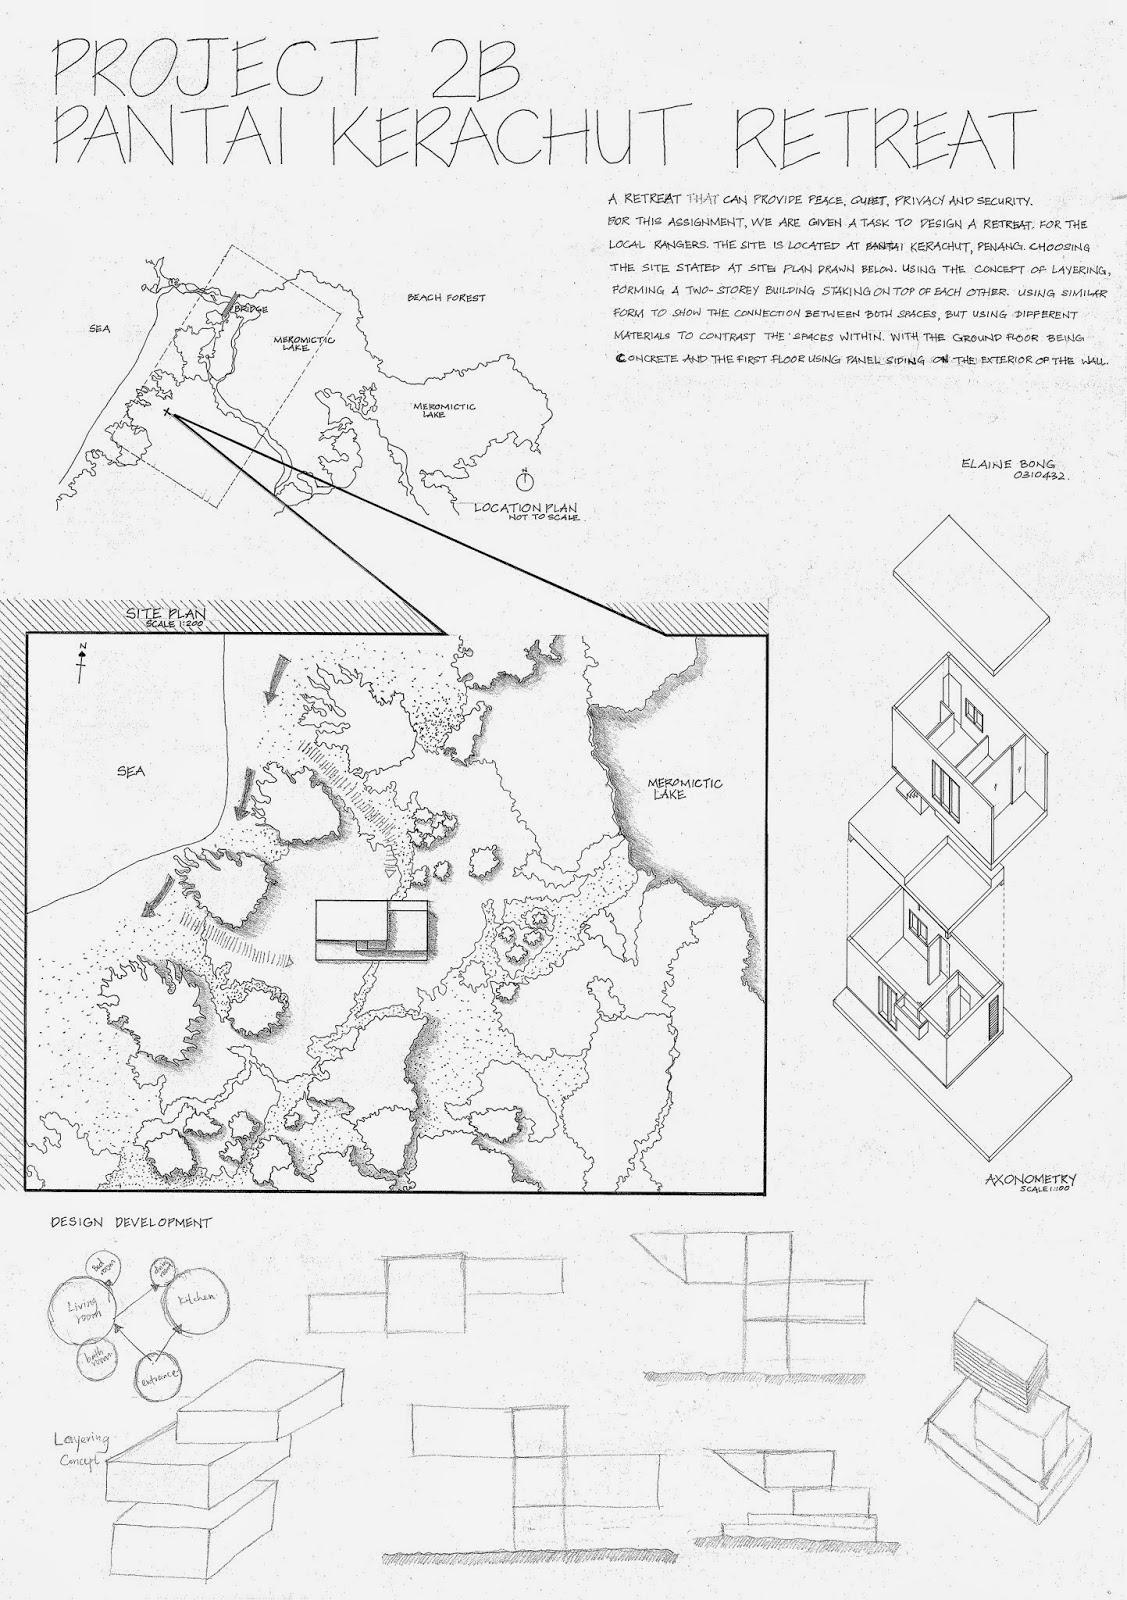 Elaine Bong E Portfolio Architectural Design Studio 2